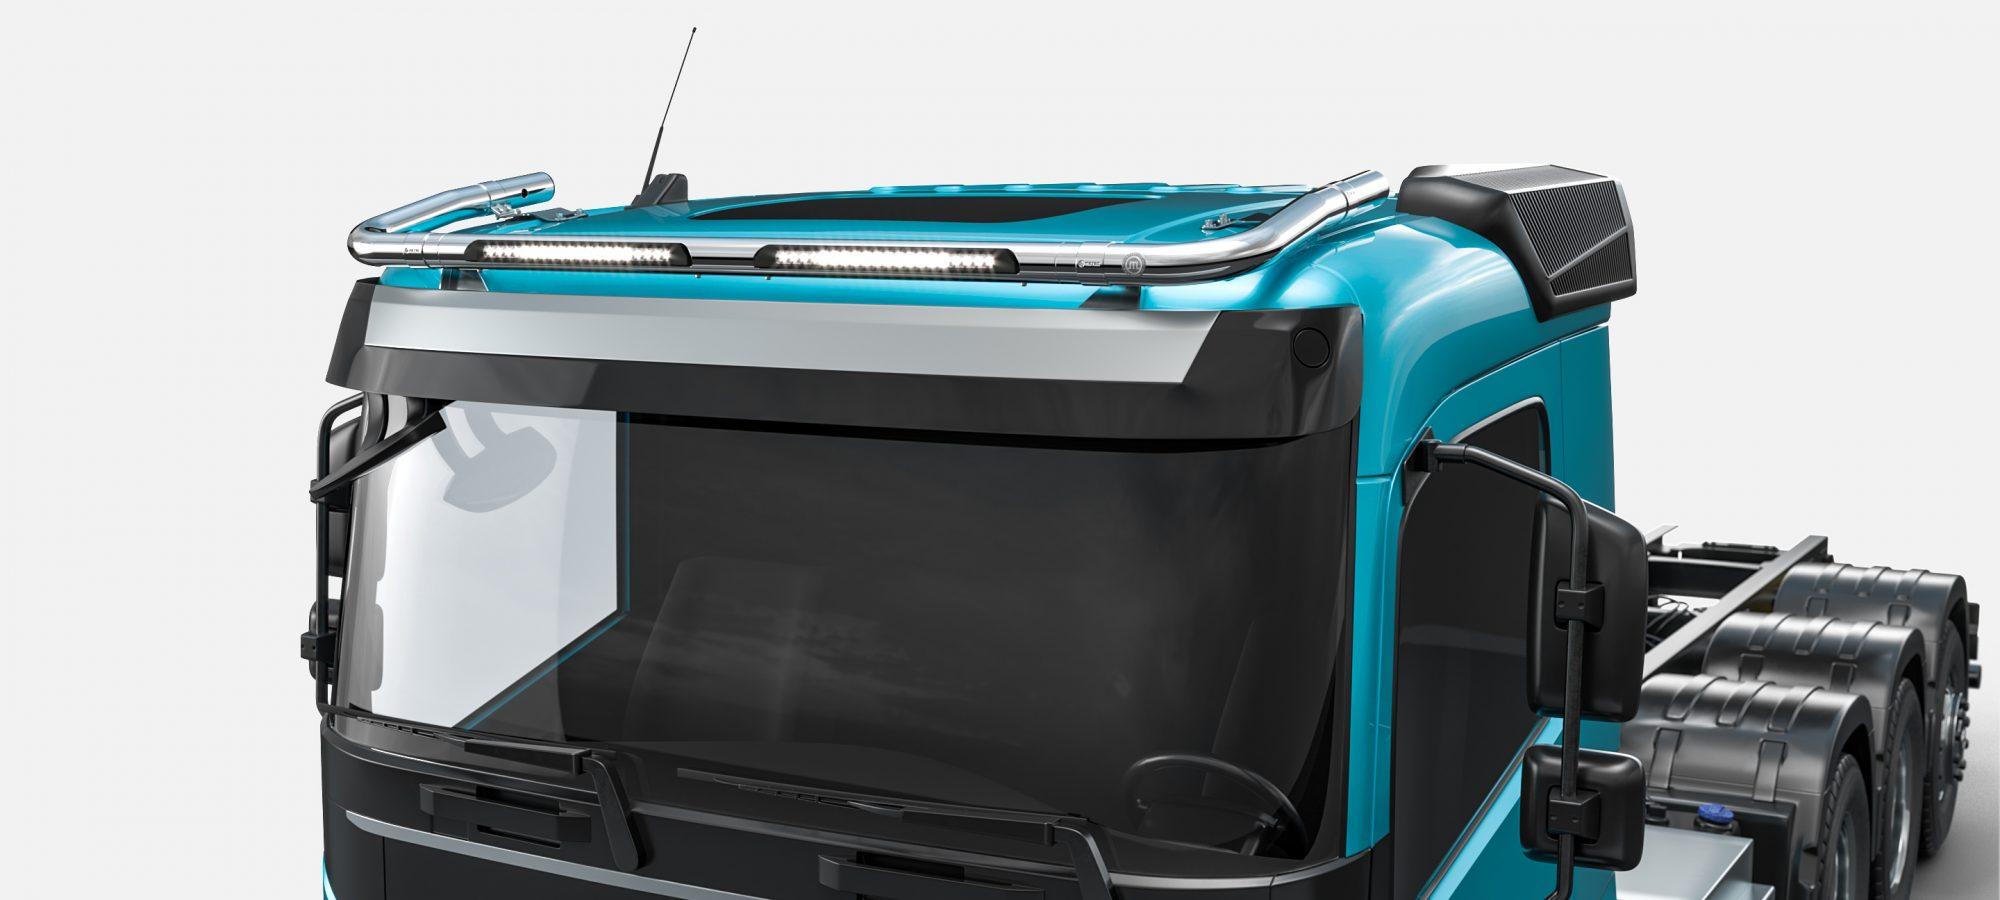 Nya produkter till Volvo FM 2021+ bakgrundsbild